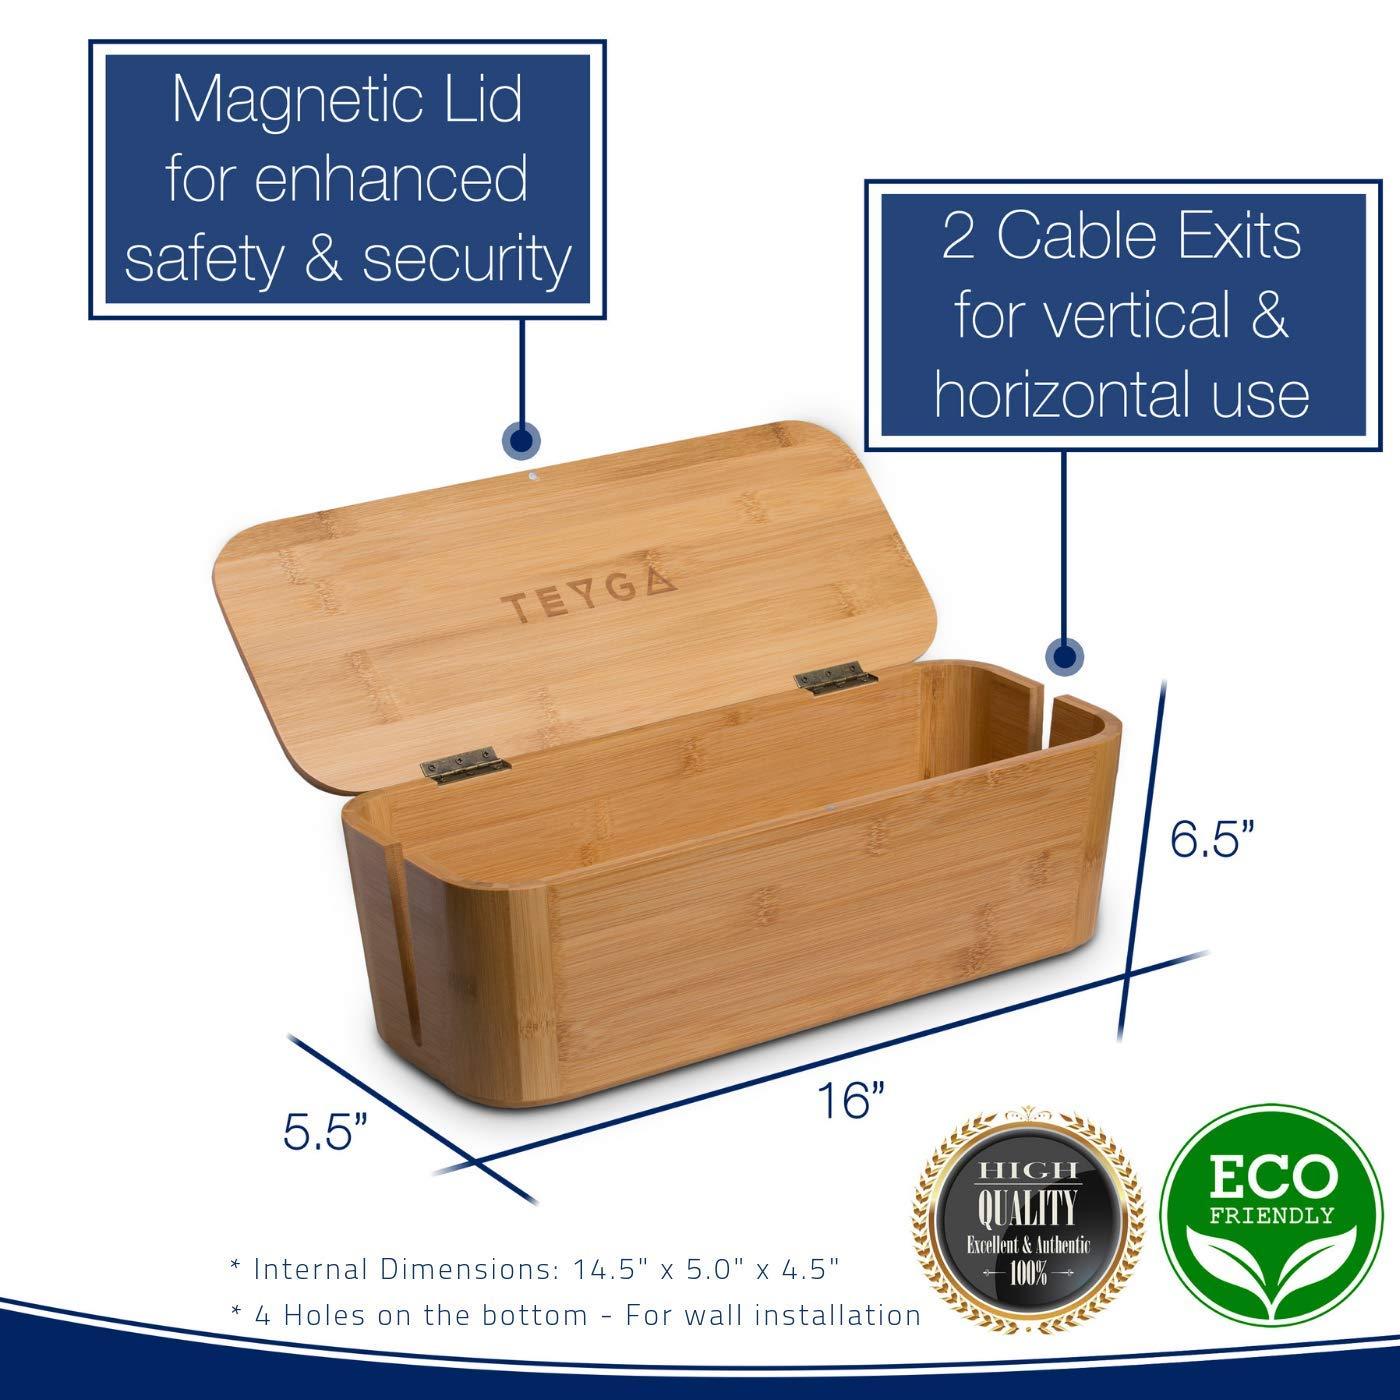 TEYGA Bamboo Cable Management Box Stylish Cord Organizer Box Hides Power Strip